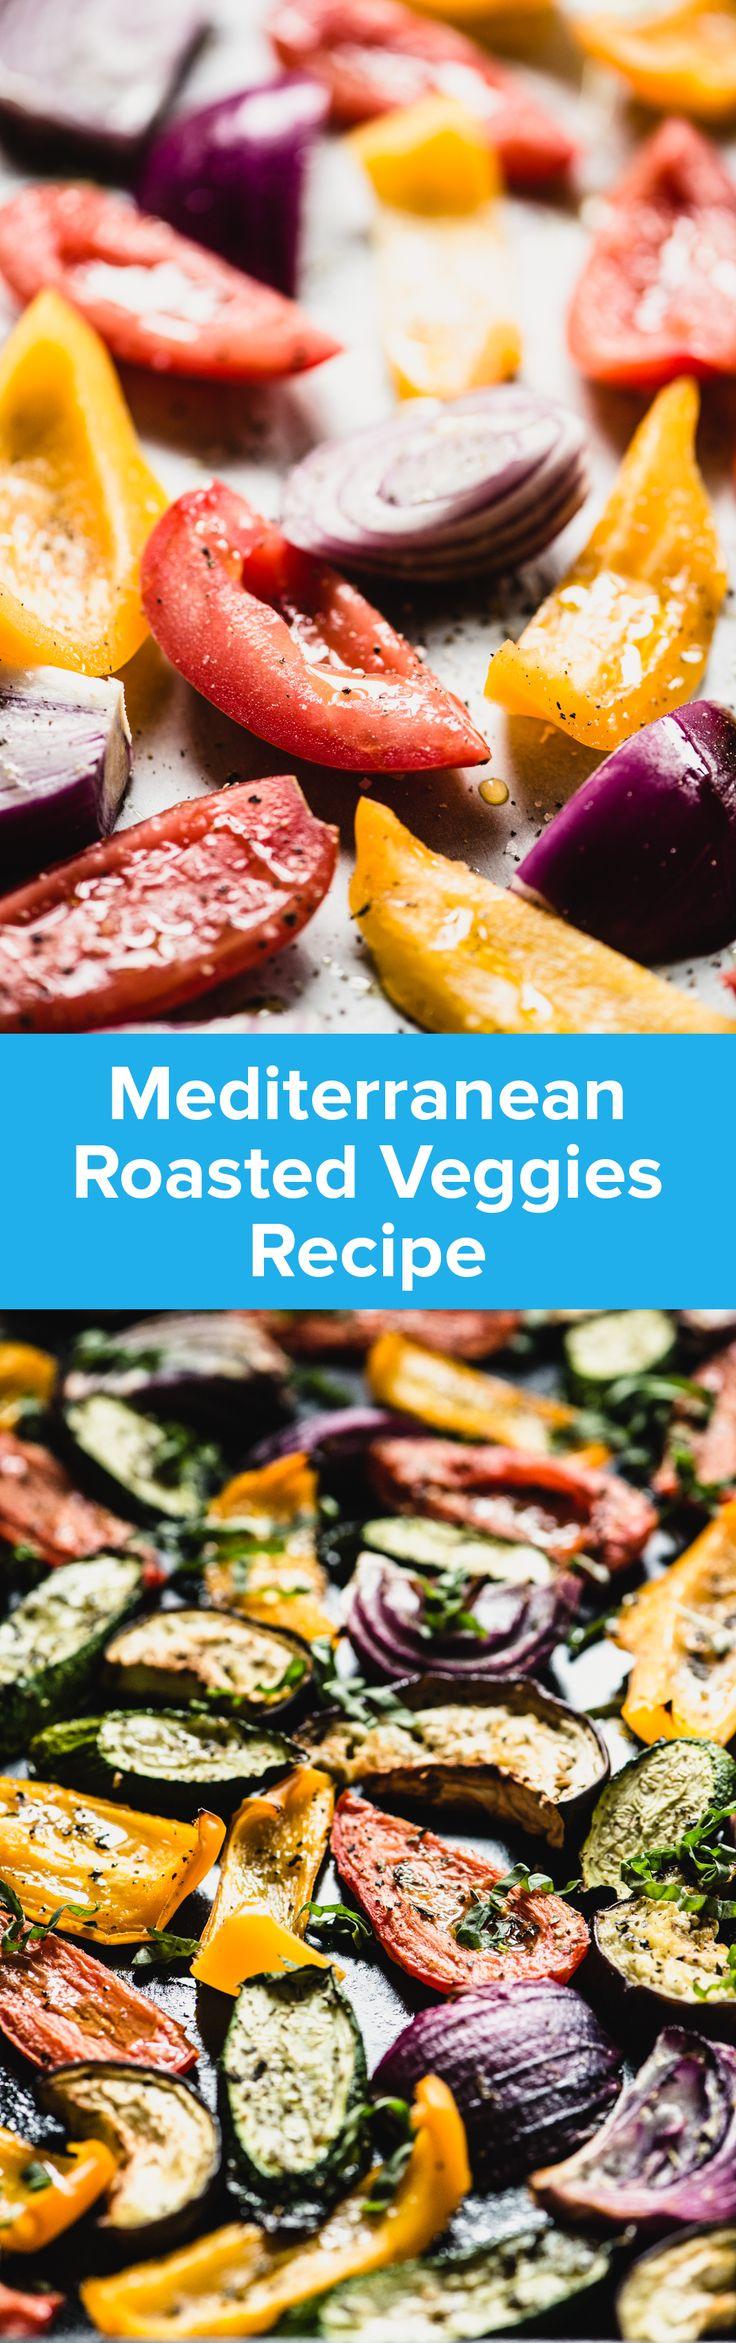 Roasted Mediterranean Veggies Recipe | StupidEasyPaleo.com